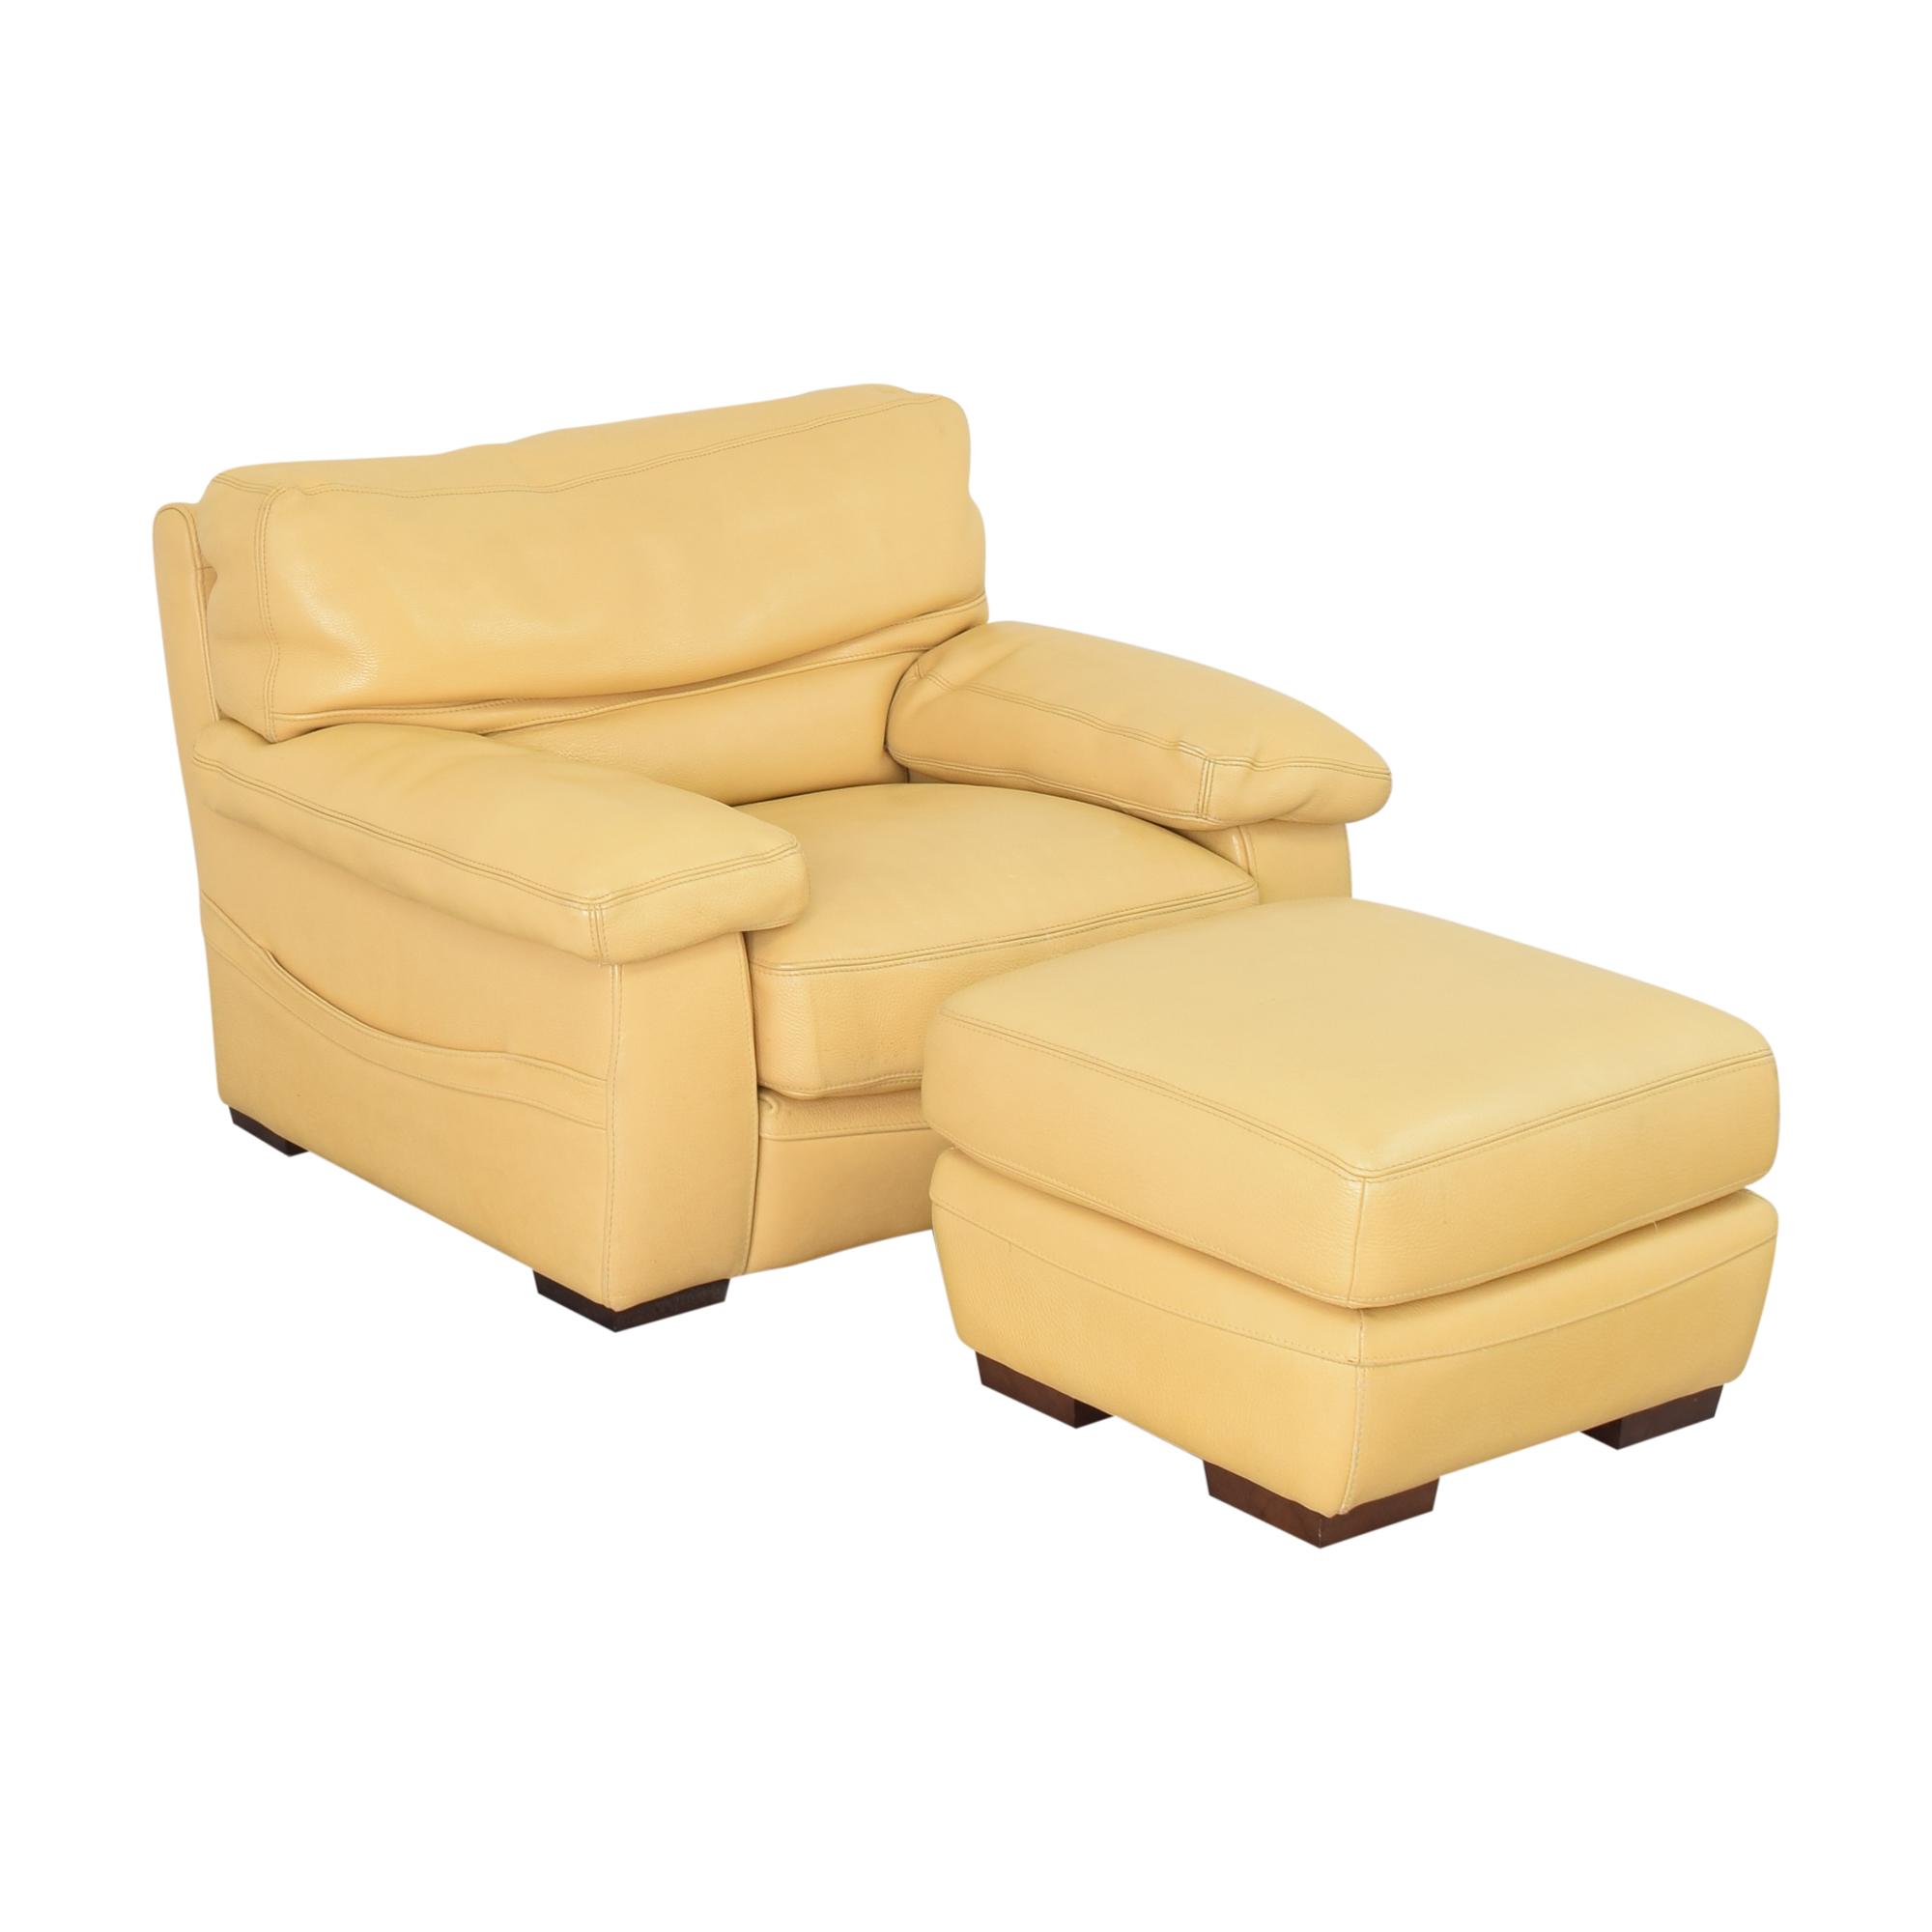 Roche Bobois Accent Armchair with Ottoman sale